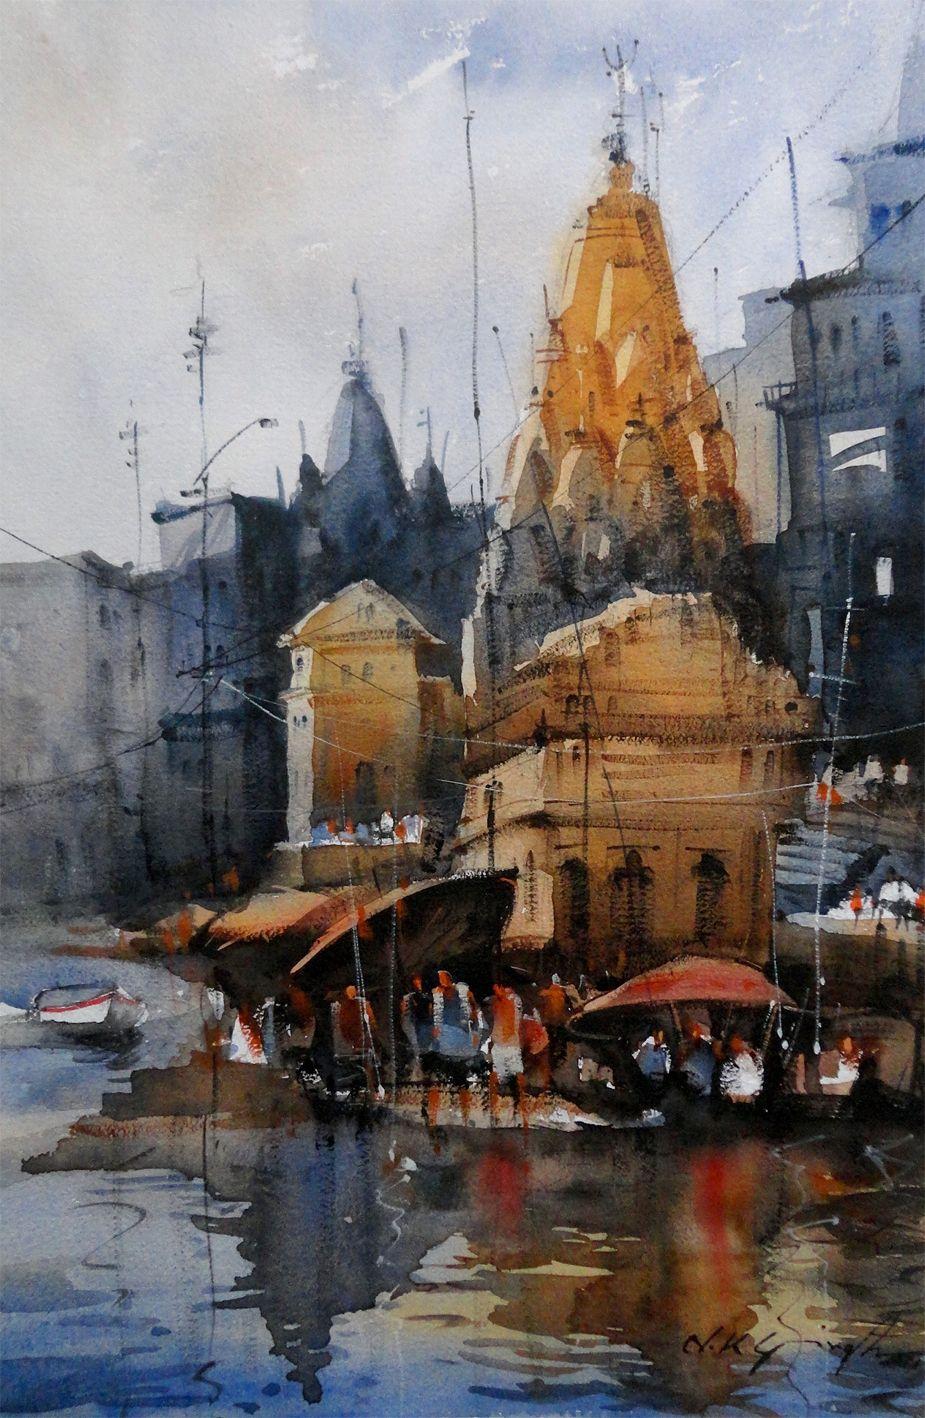 Indian Temple Watercolor Painting Watercolor Landscape Paintings Indian Art Paintings Watercolor Art